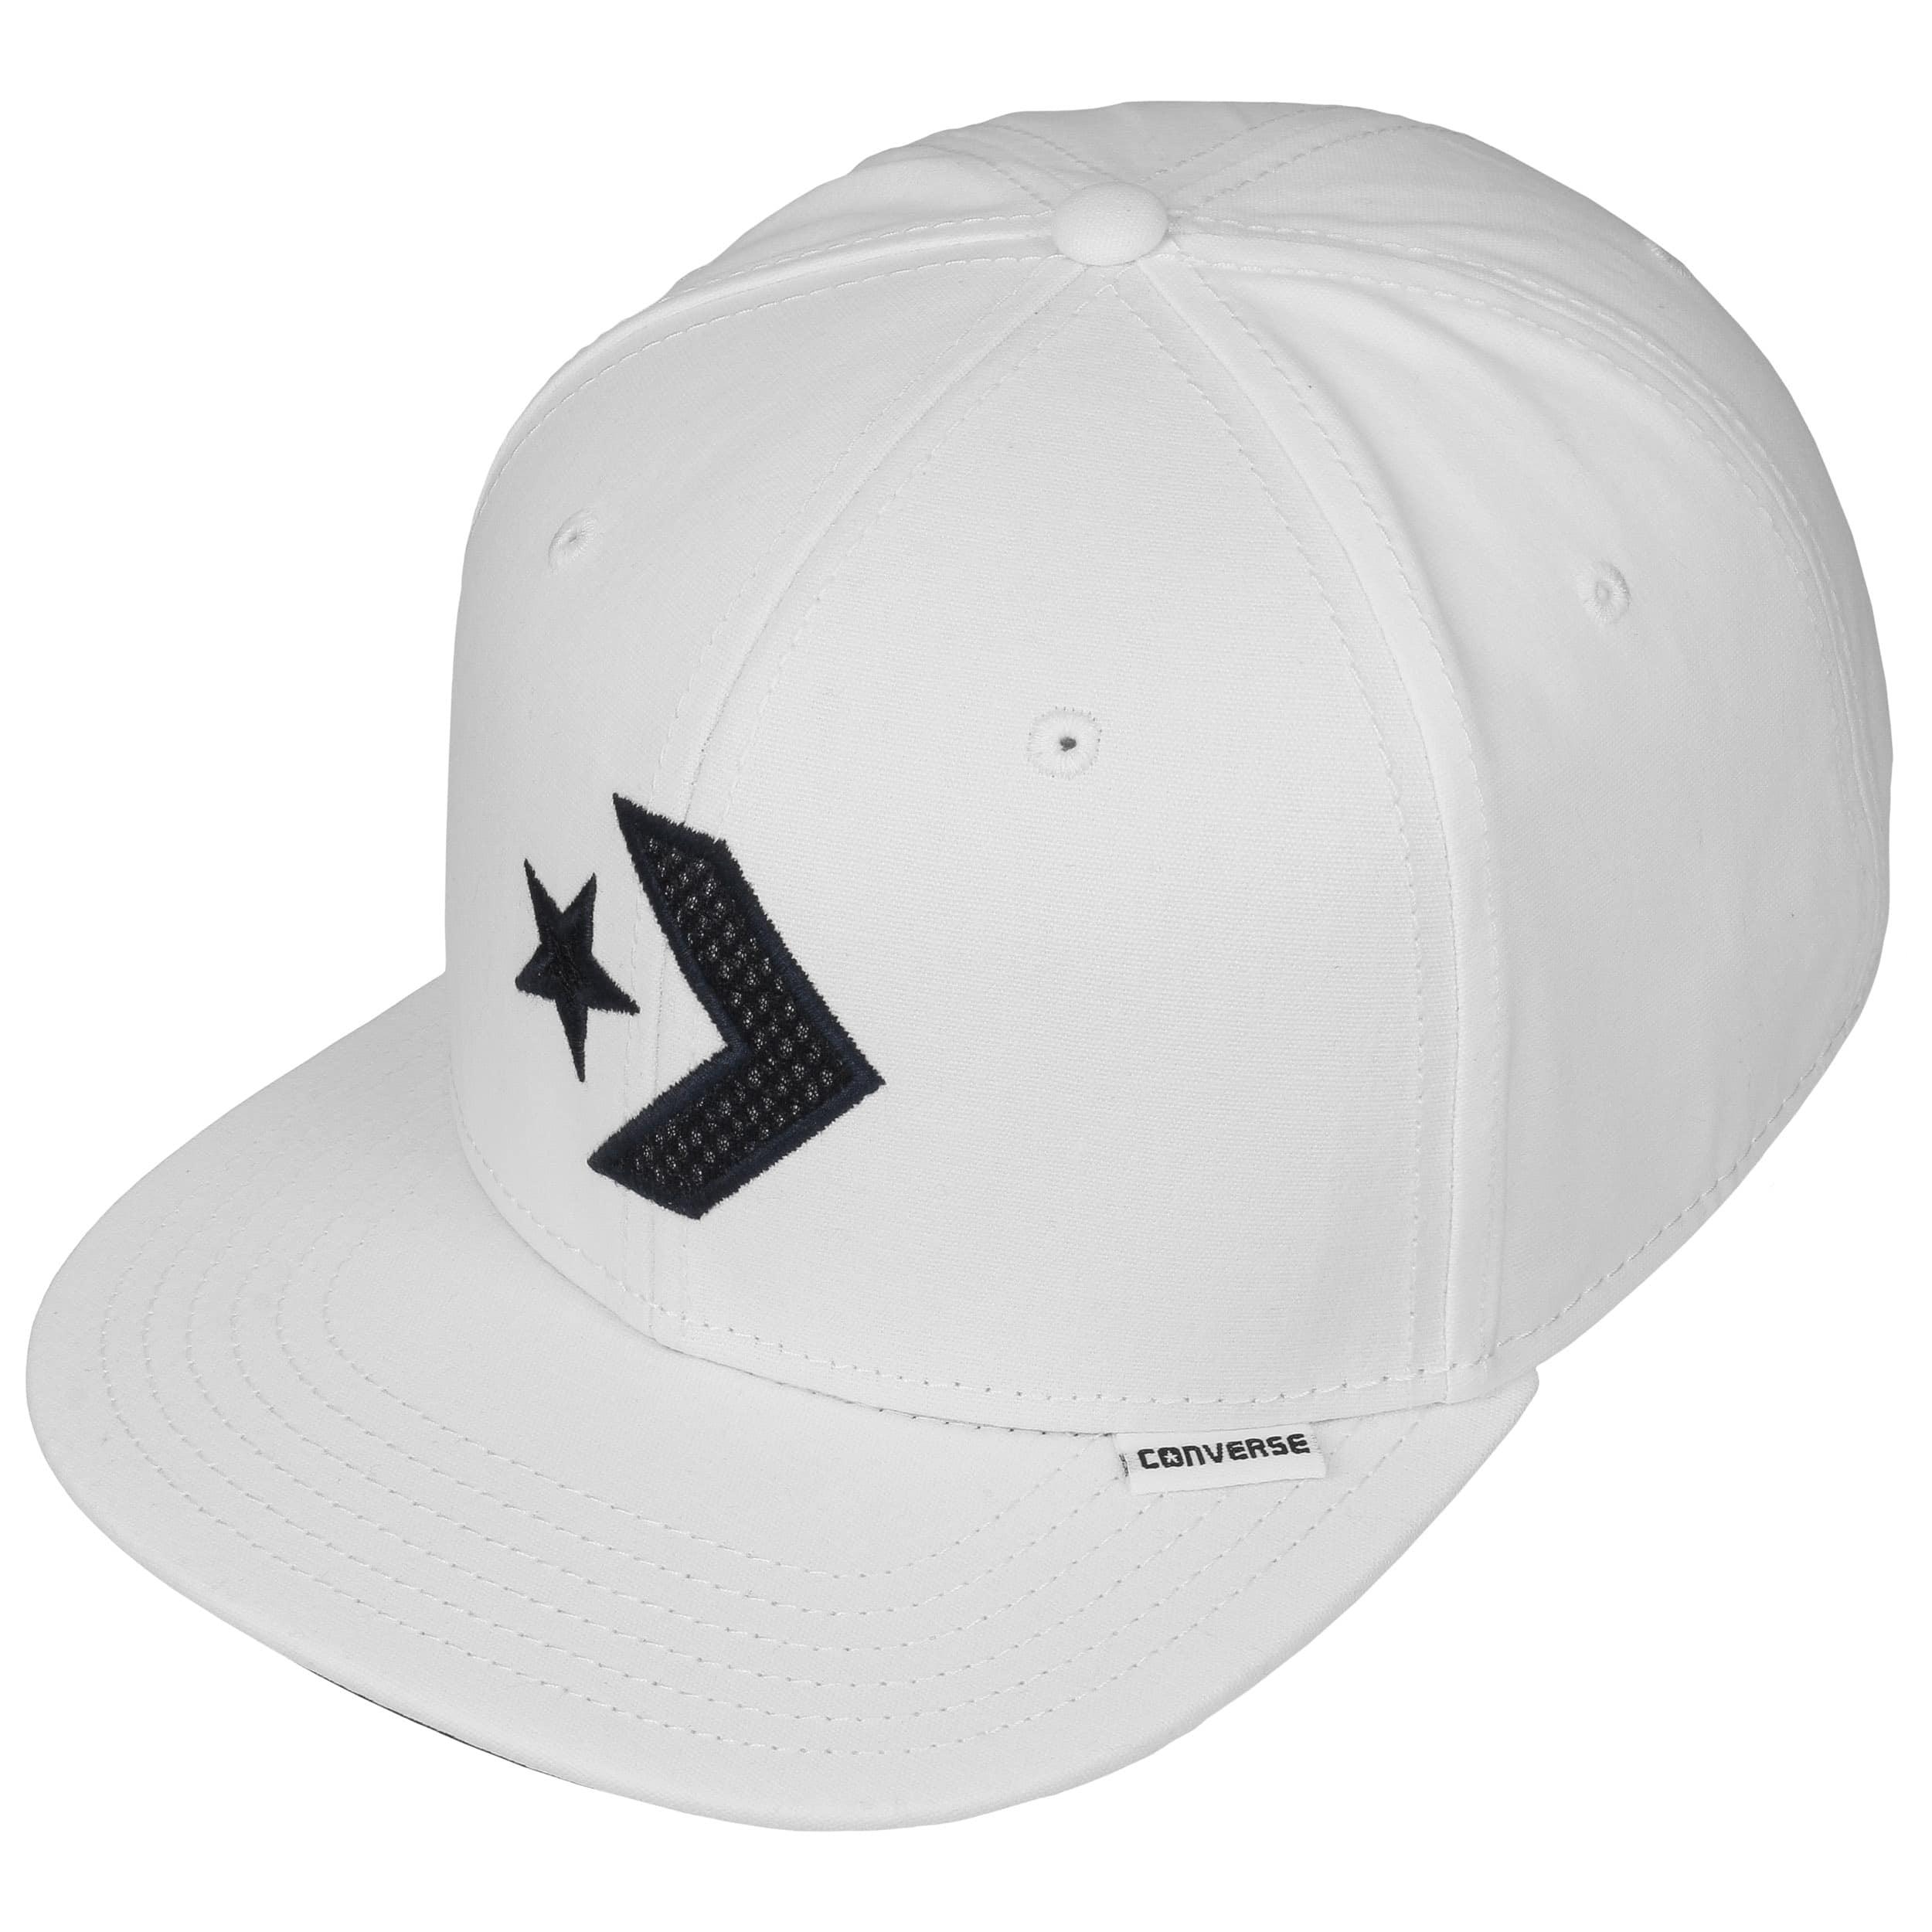 Gorra Star Chevron Snapback by Converse - Gorras - sombreroshop.es 36f21819d2e